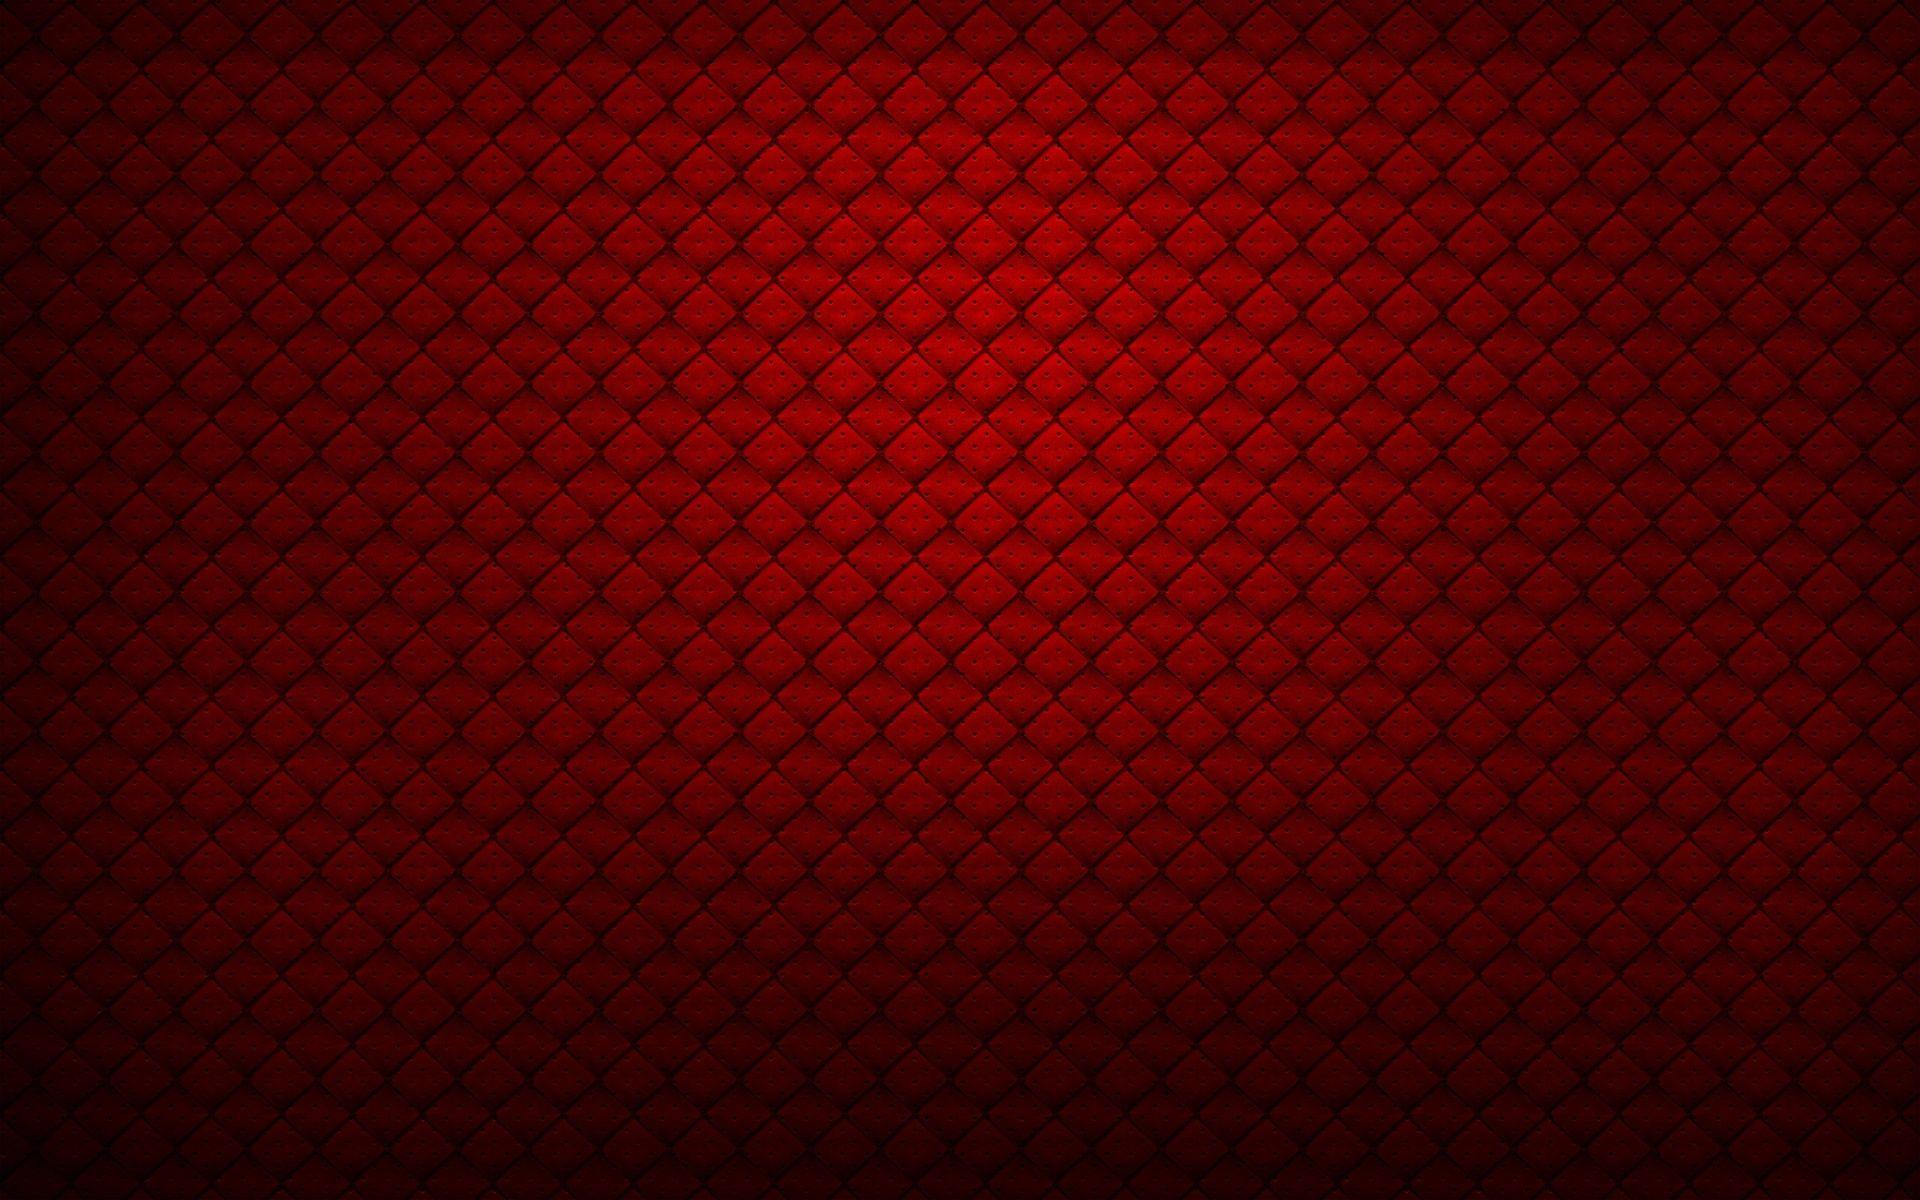 Wallpaper Red Wallpapers Tiles Wallpaper Kitchen 1920x1200 Red Wallpaper Tile Wallpaper Red Tiles